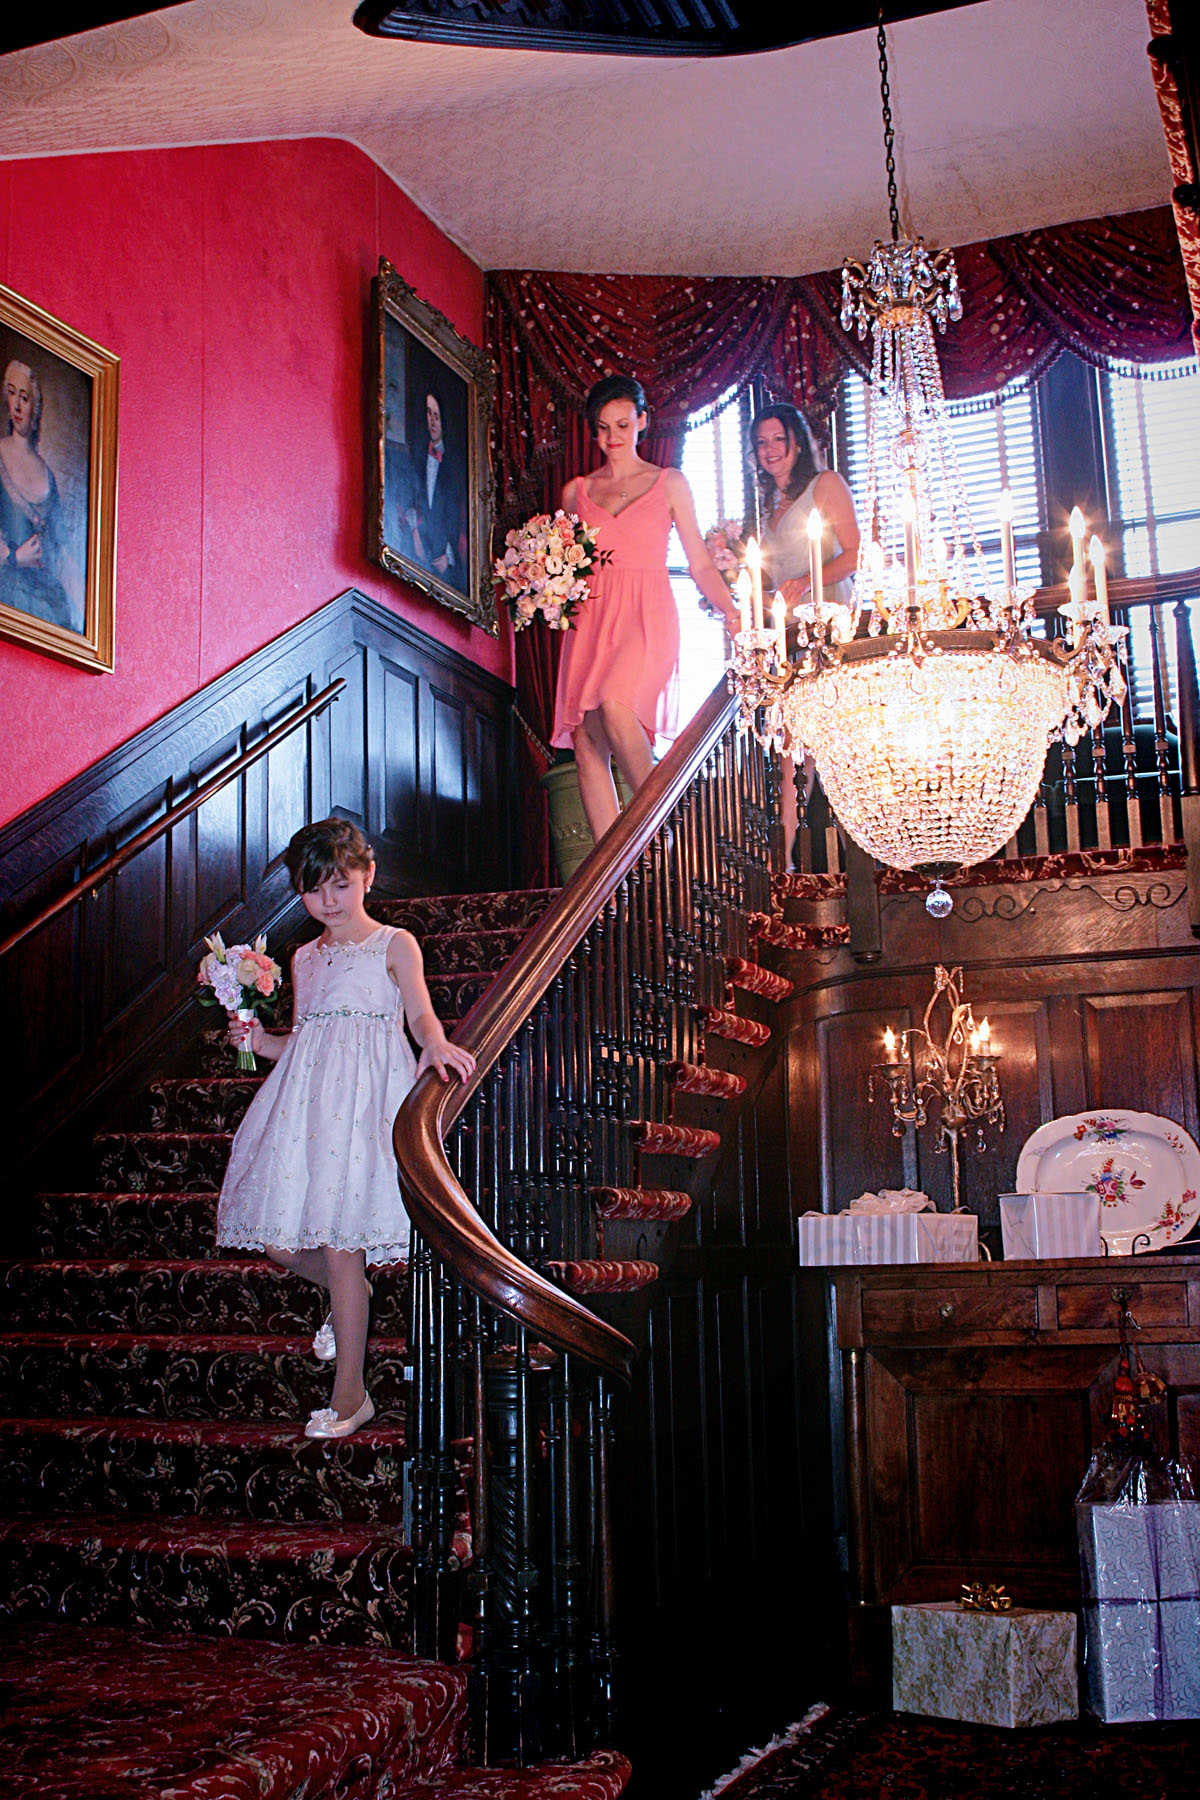 emily_liz_amanda_ceremony_staircase_1.jpg